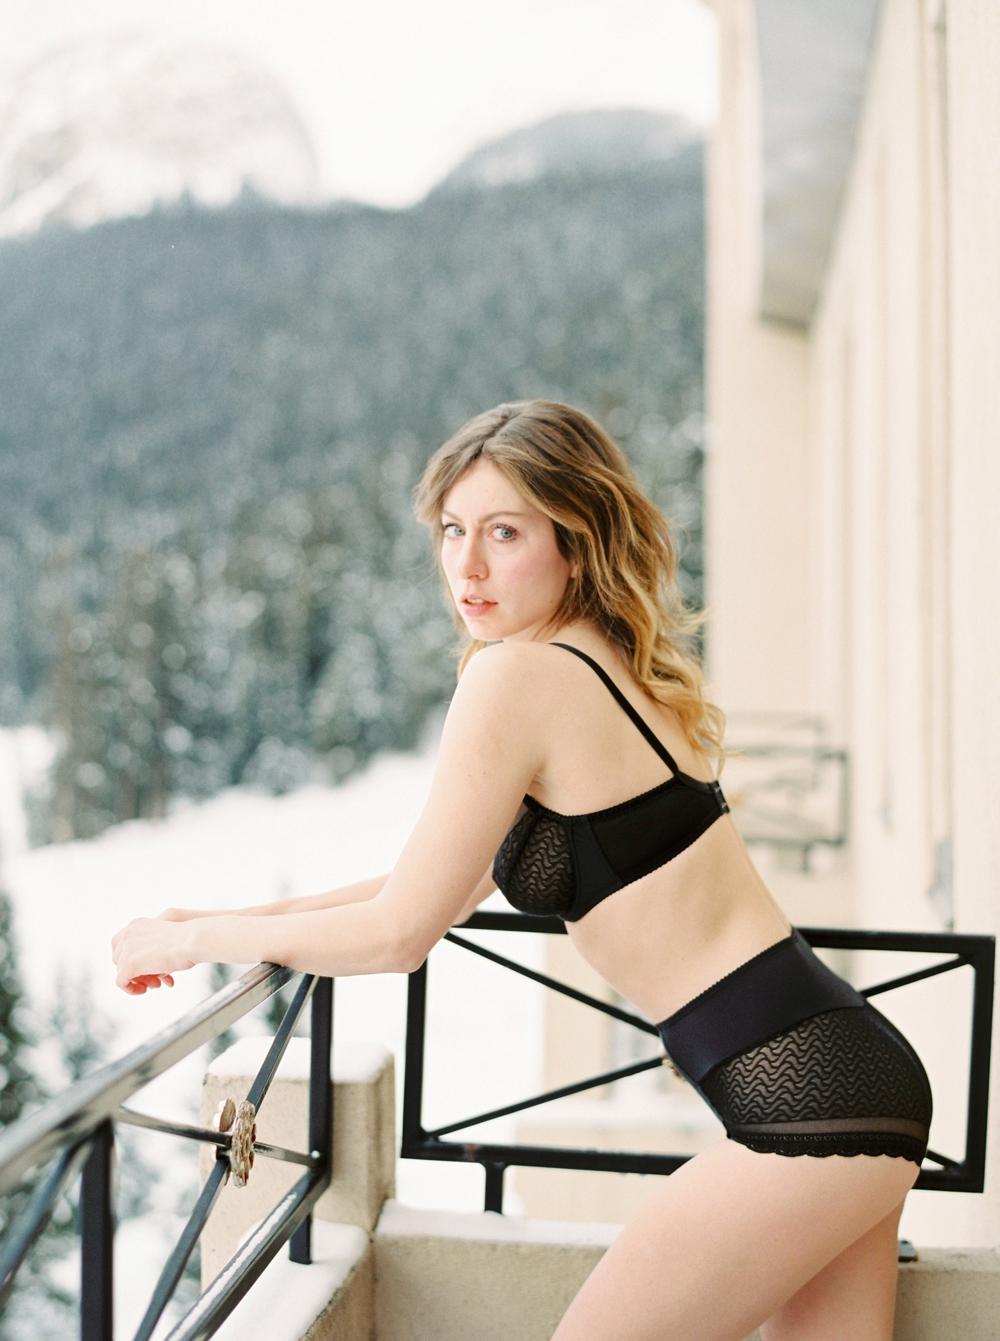 Calgary Boudoir Photographers | Life Set Sail | Fashion Photographer Blogger | Justine Milton Photography | Fairmont Chateau Lake Louise